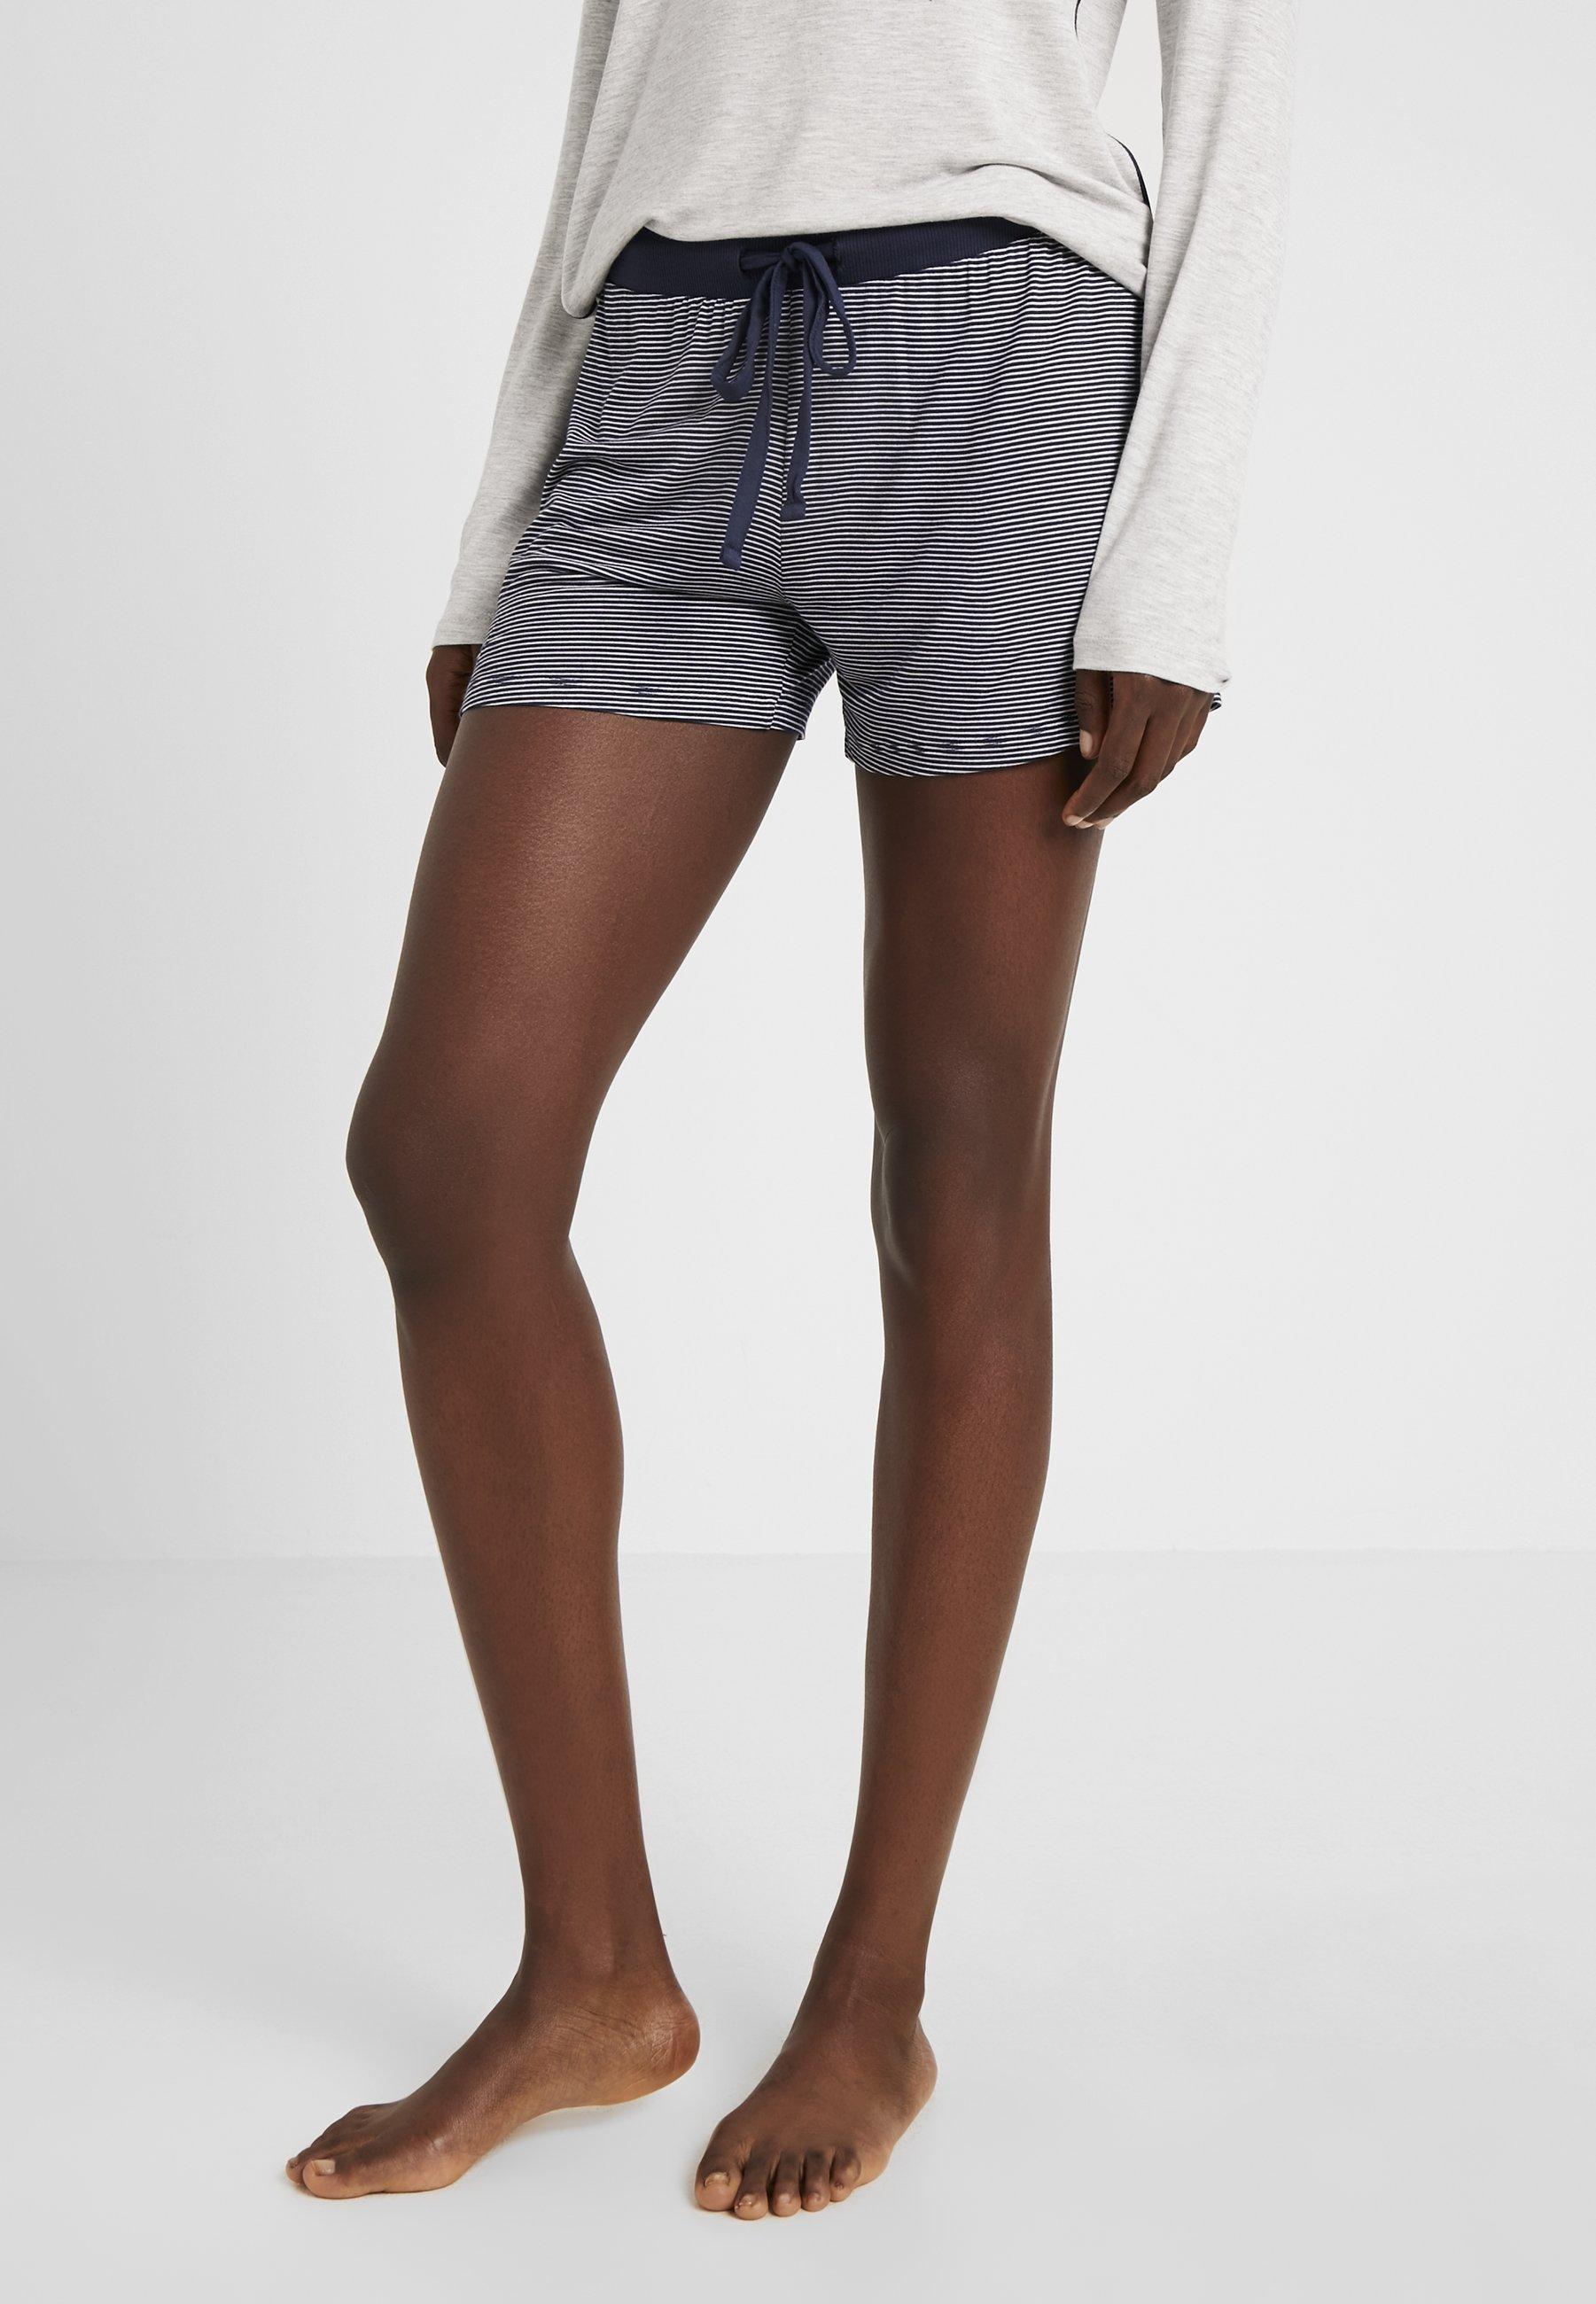 Donna JAYLA SINGLE - Pantaloni del pigiama